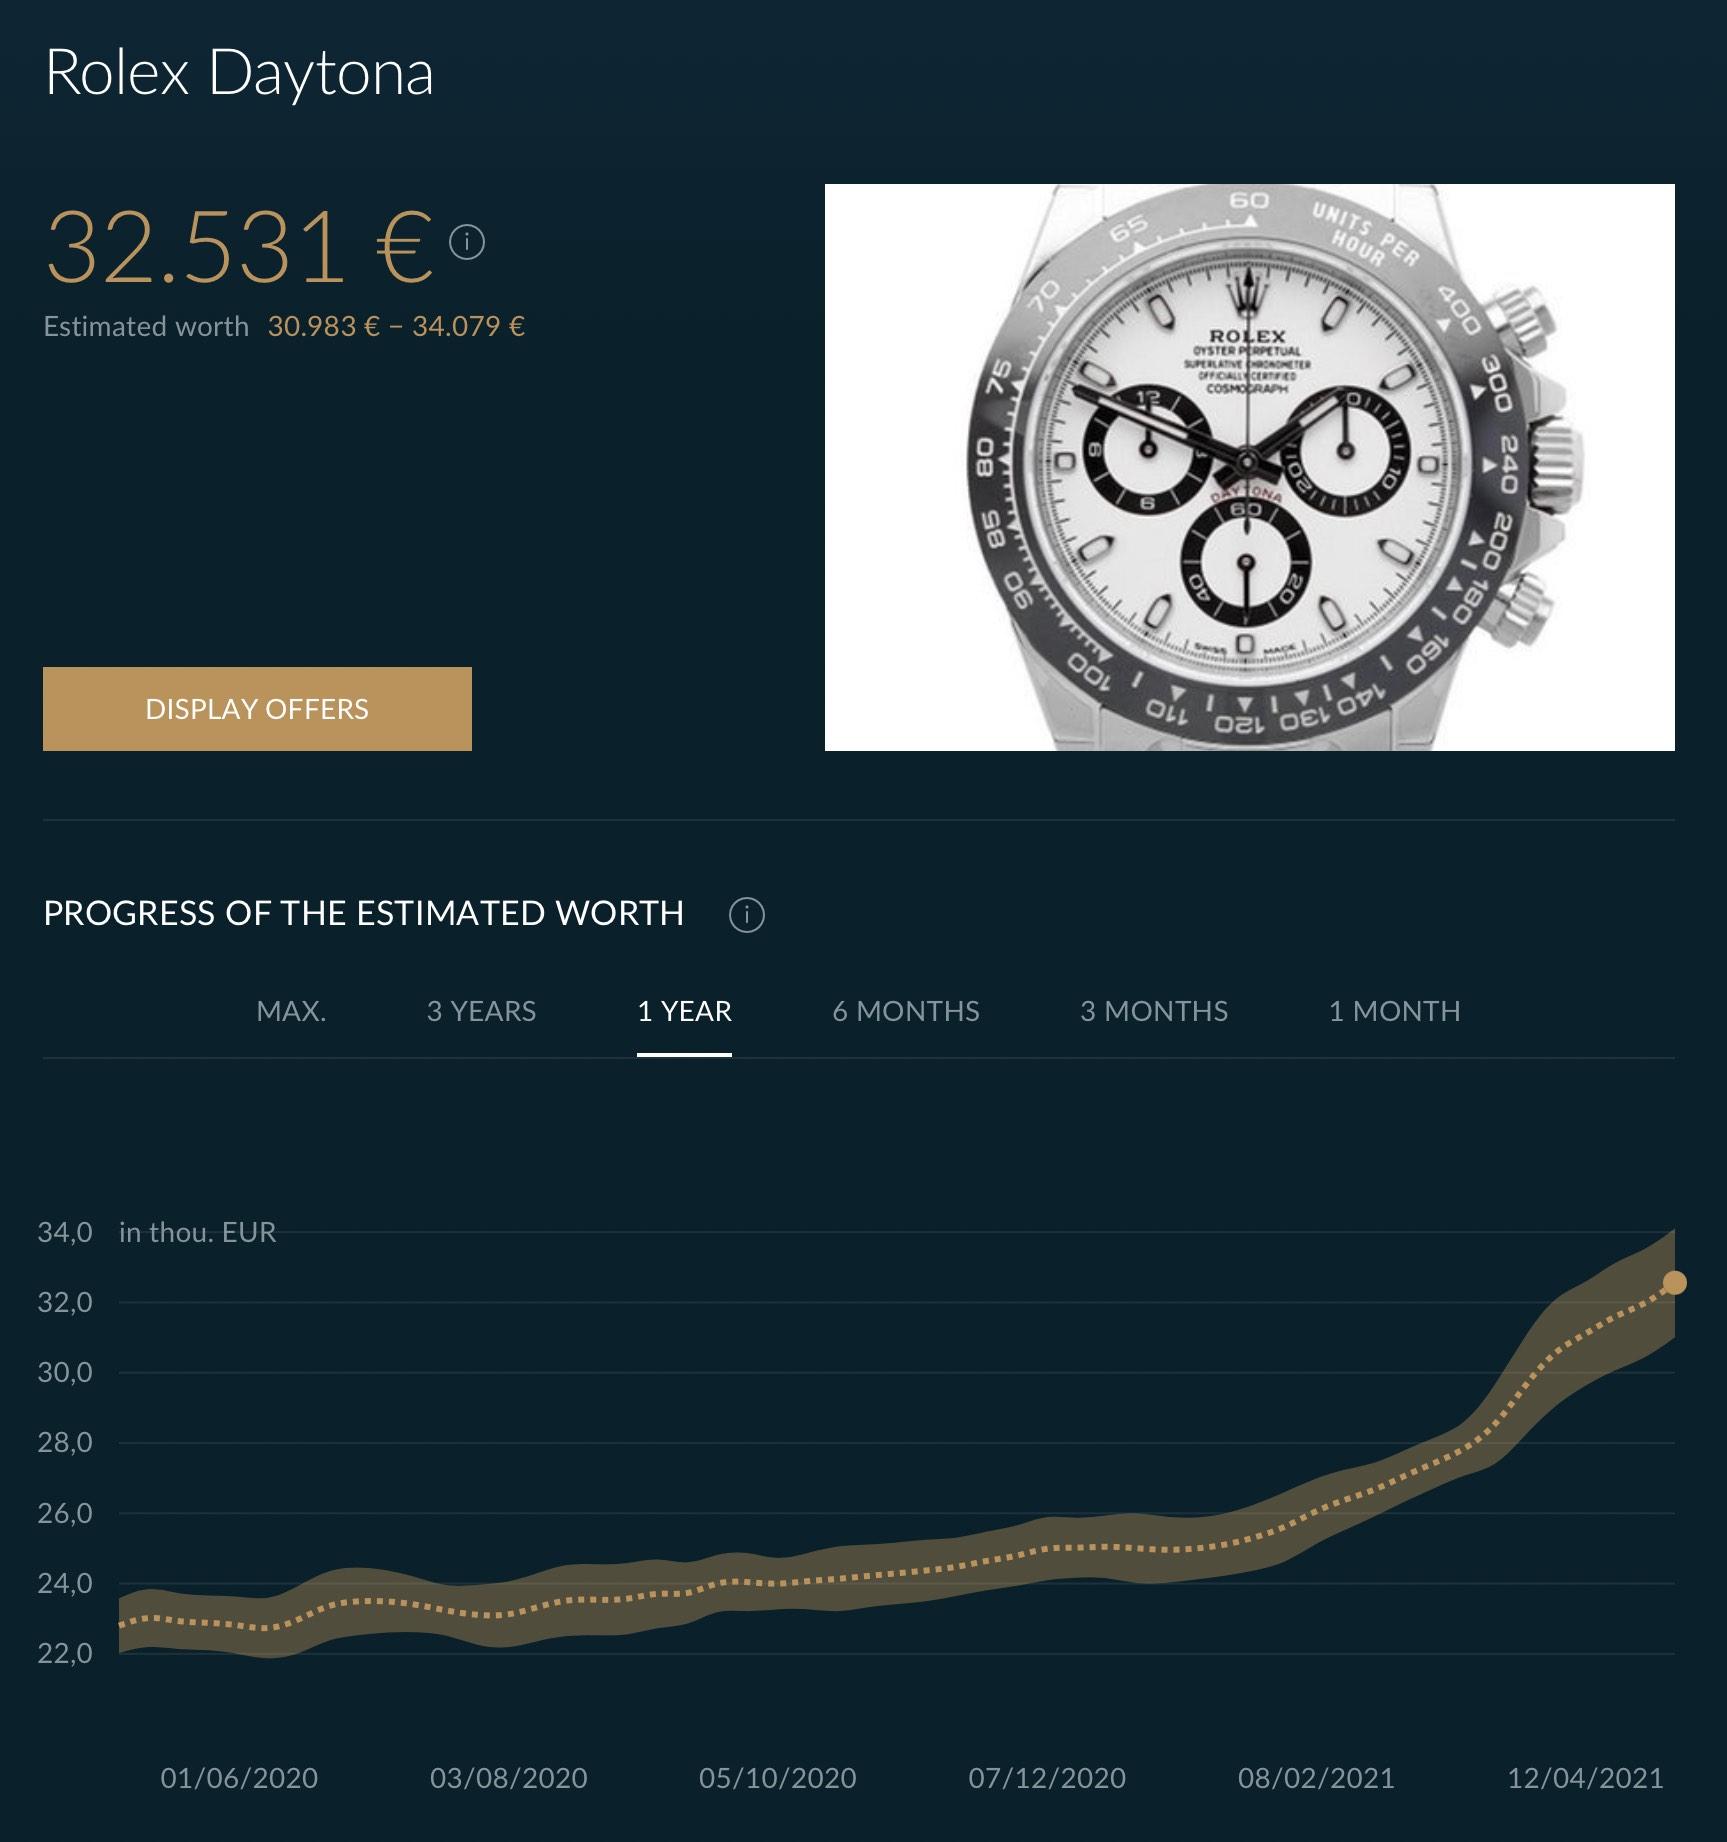 Rolex Daytona 116500LN Market analysis - continuous and insane rise price - 12